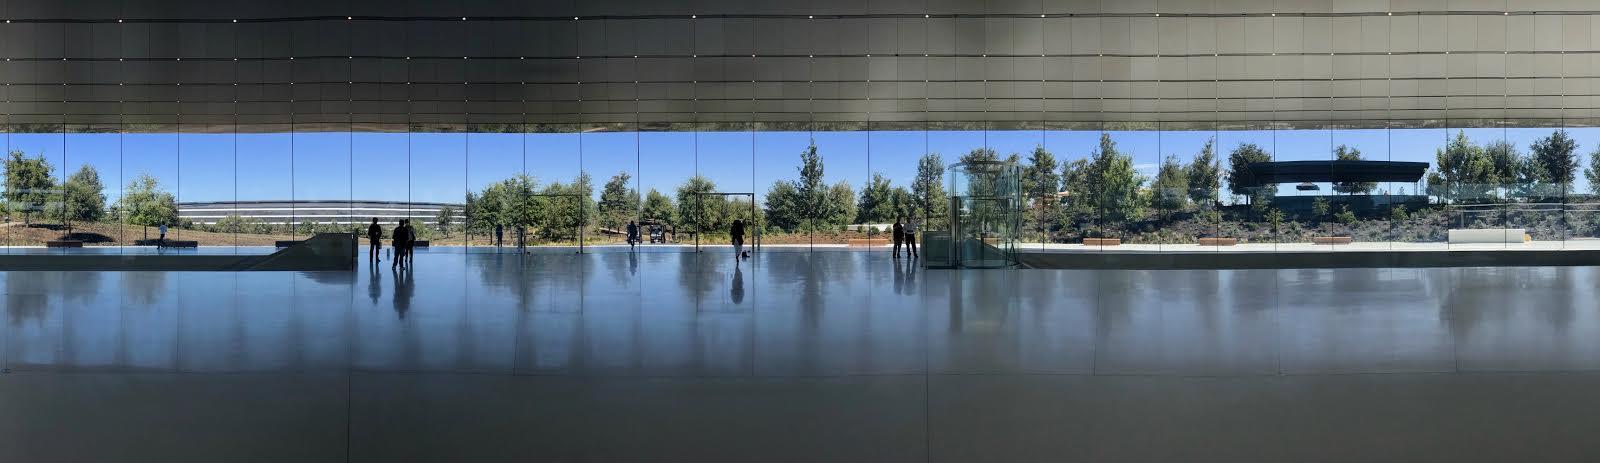 Steve Jobs Theatre Panorama